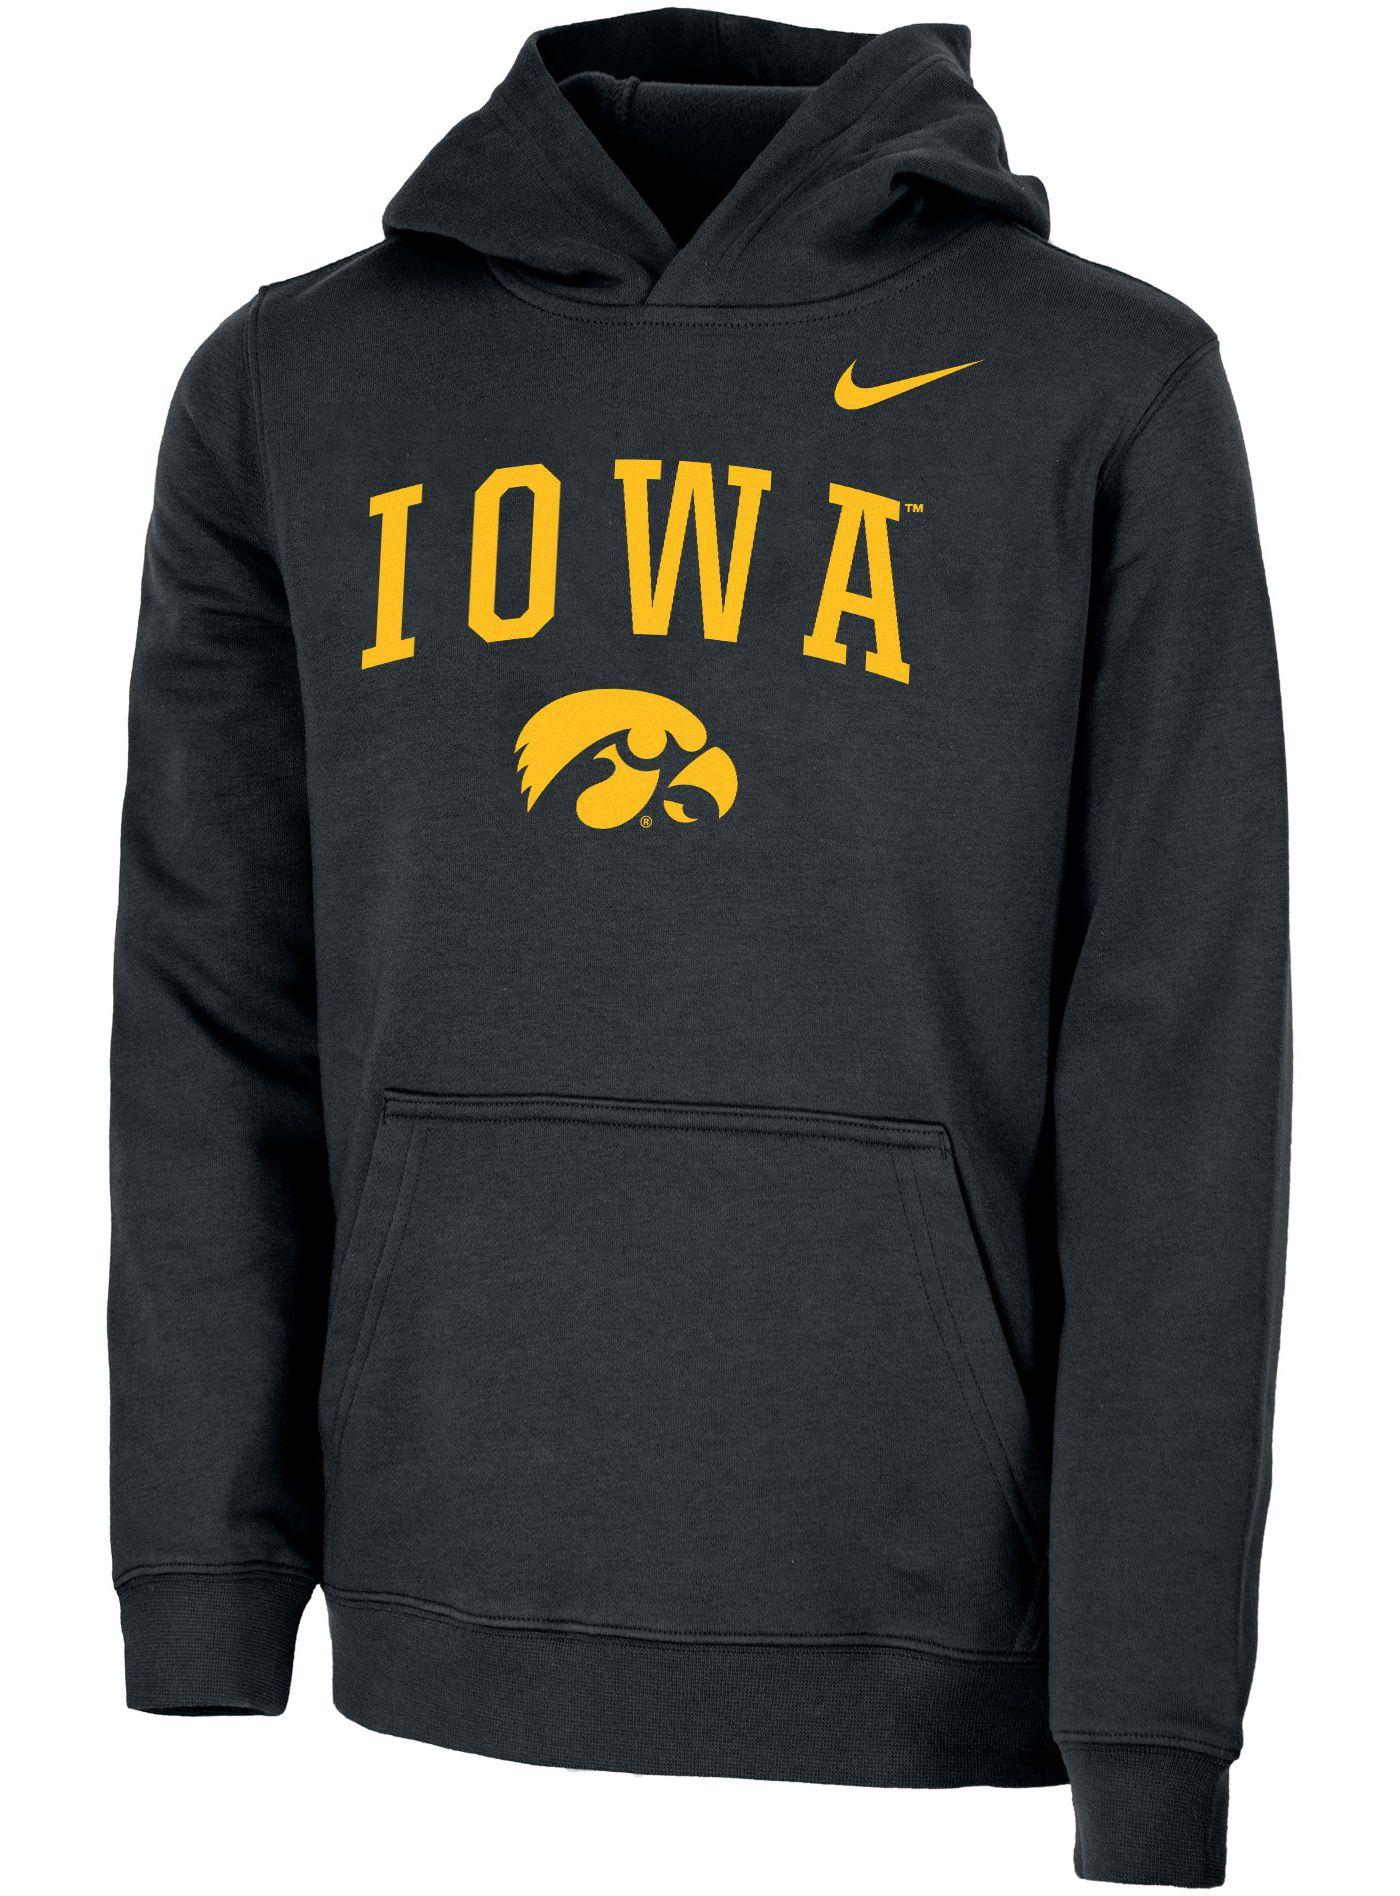 Nike Youth Iowa Hawkeyes Club Fleece Pullover Black Hoodie